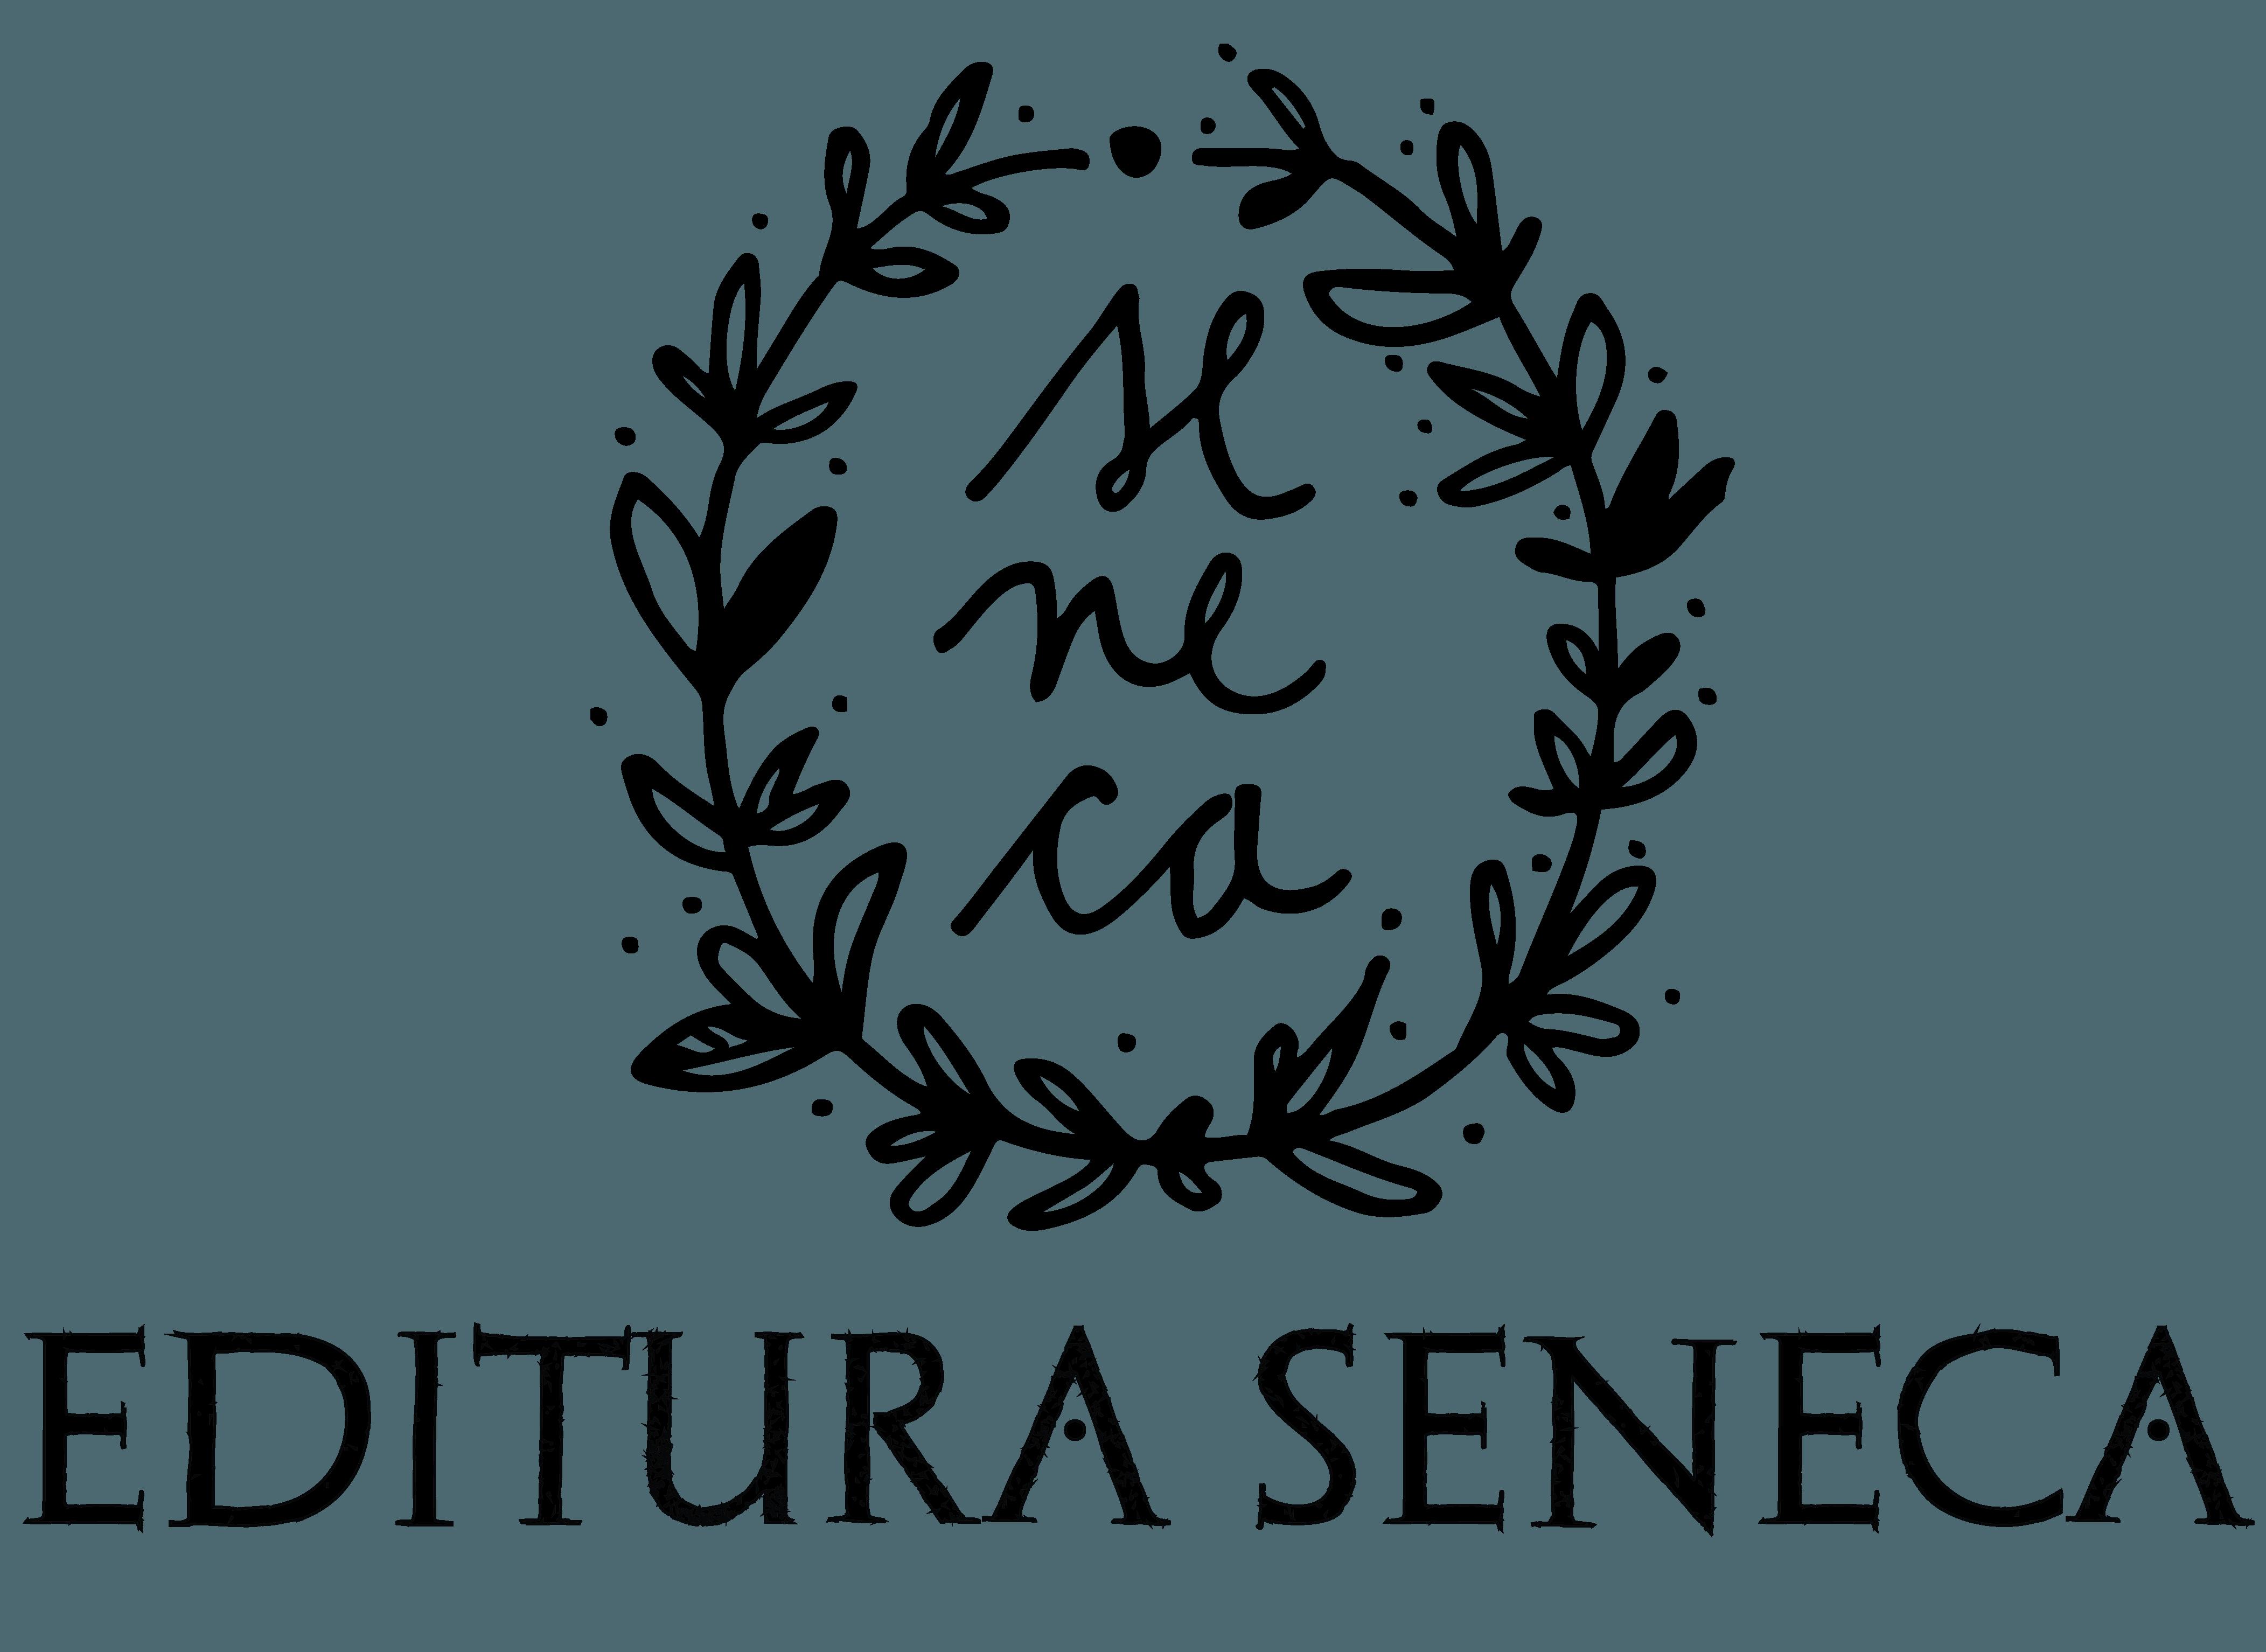 Editura Seneca